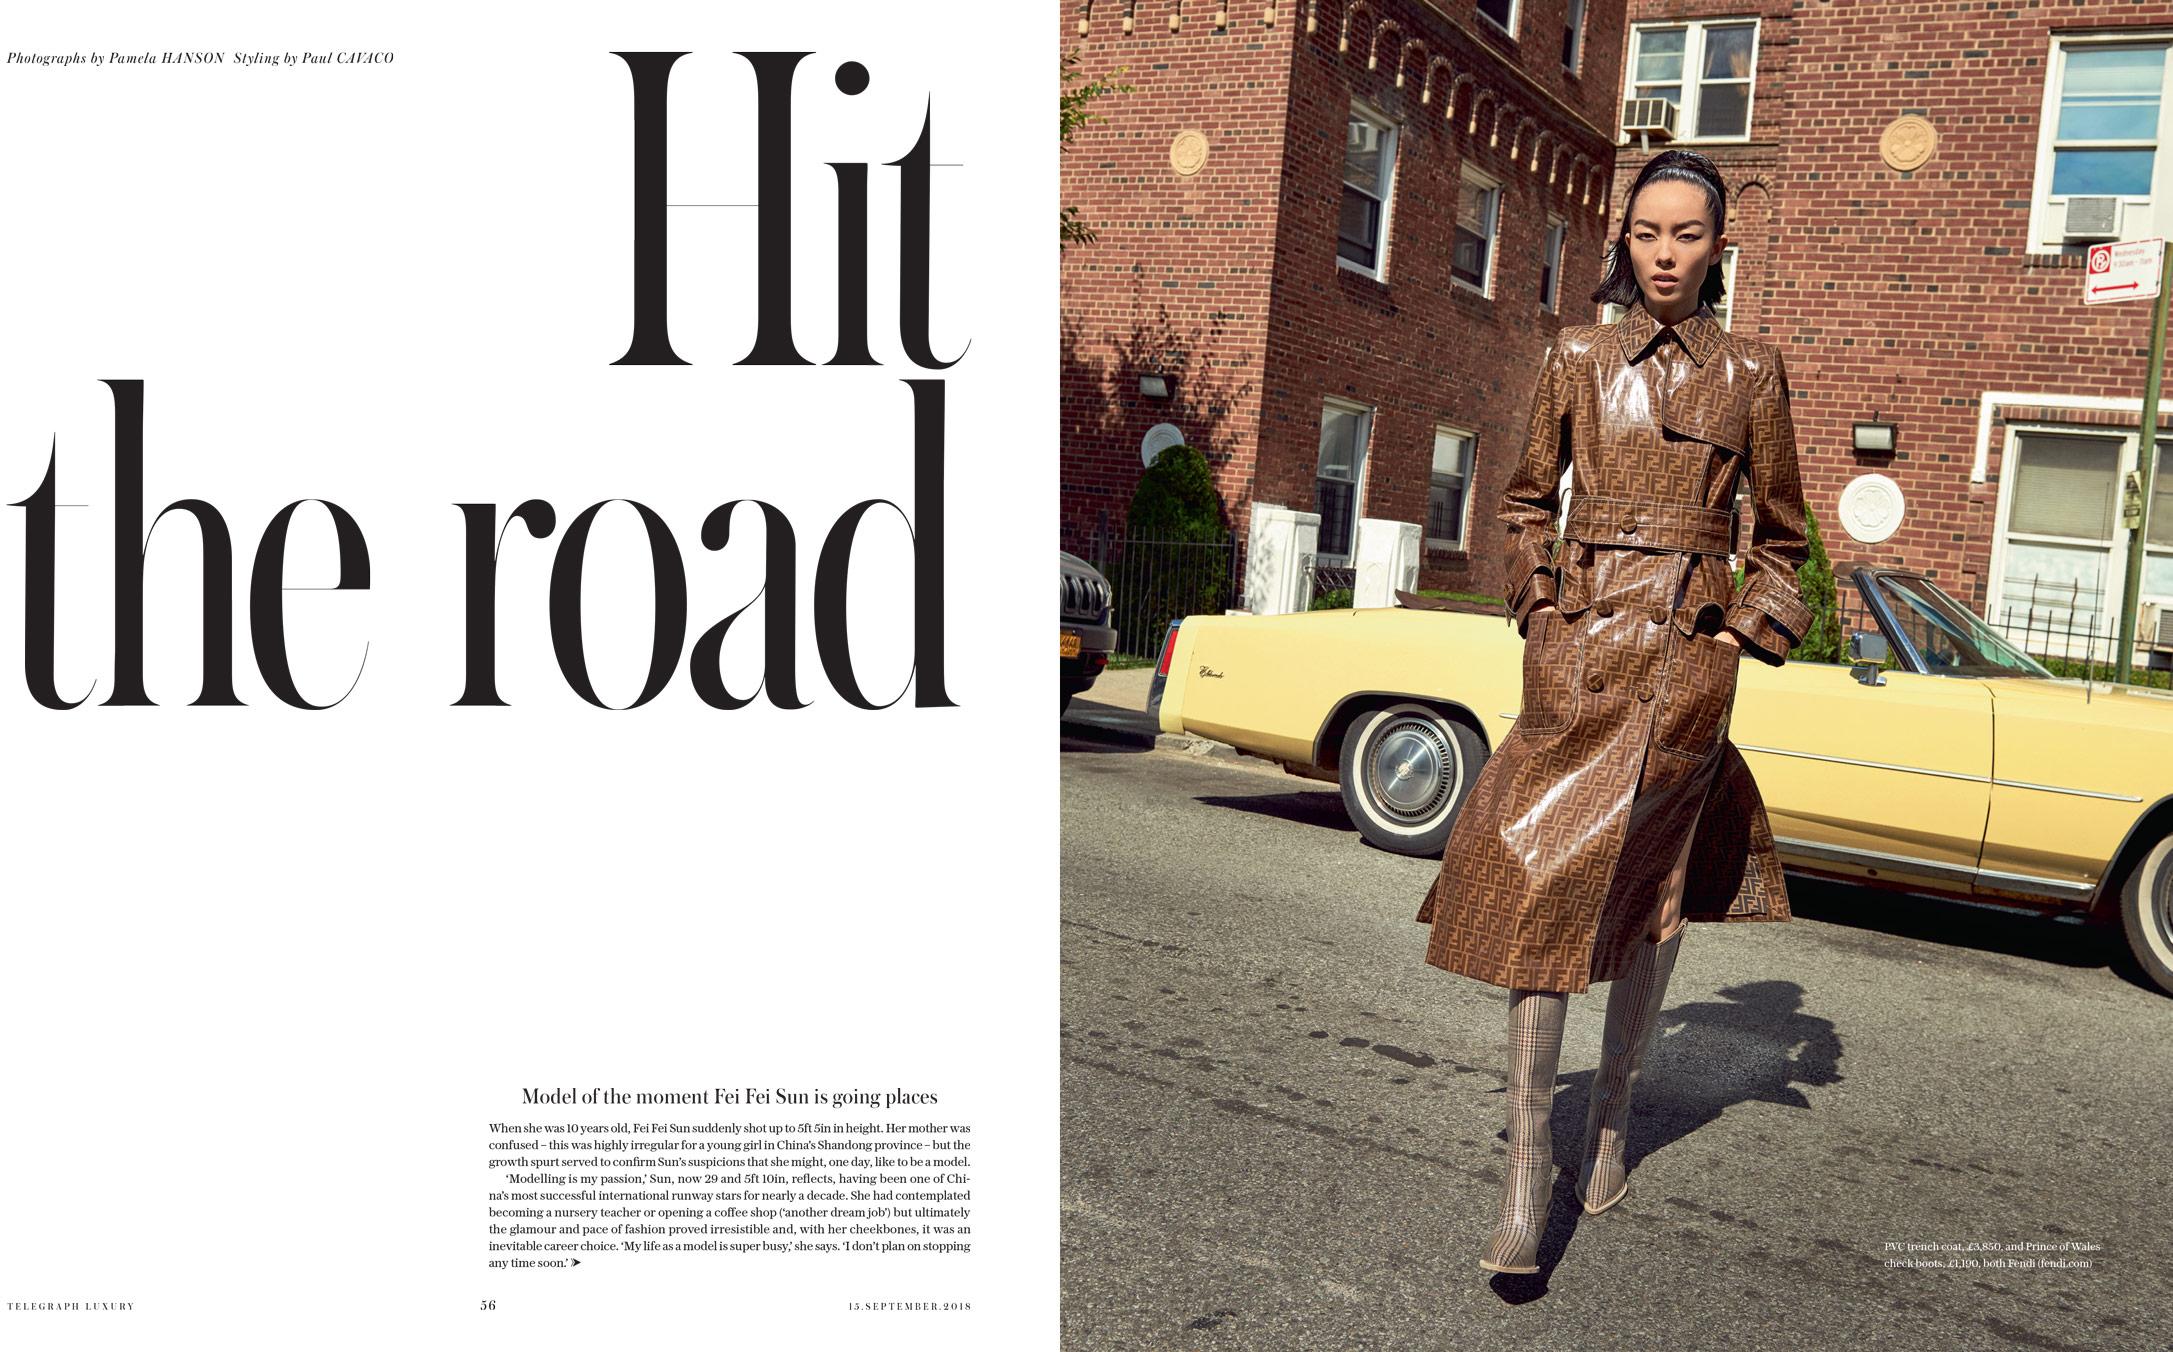 15-Sep-Lux-Fashion_PamelaHanson_Reduced-1.jpg